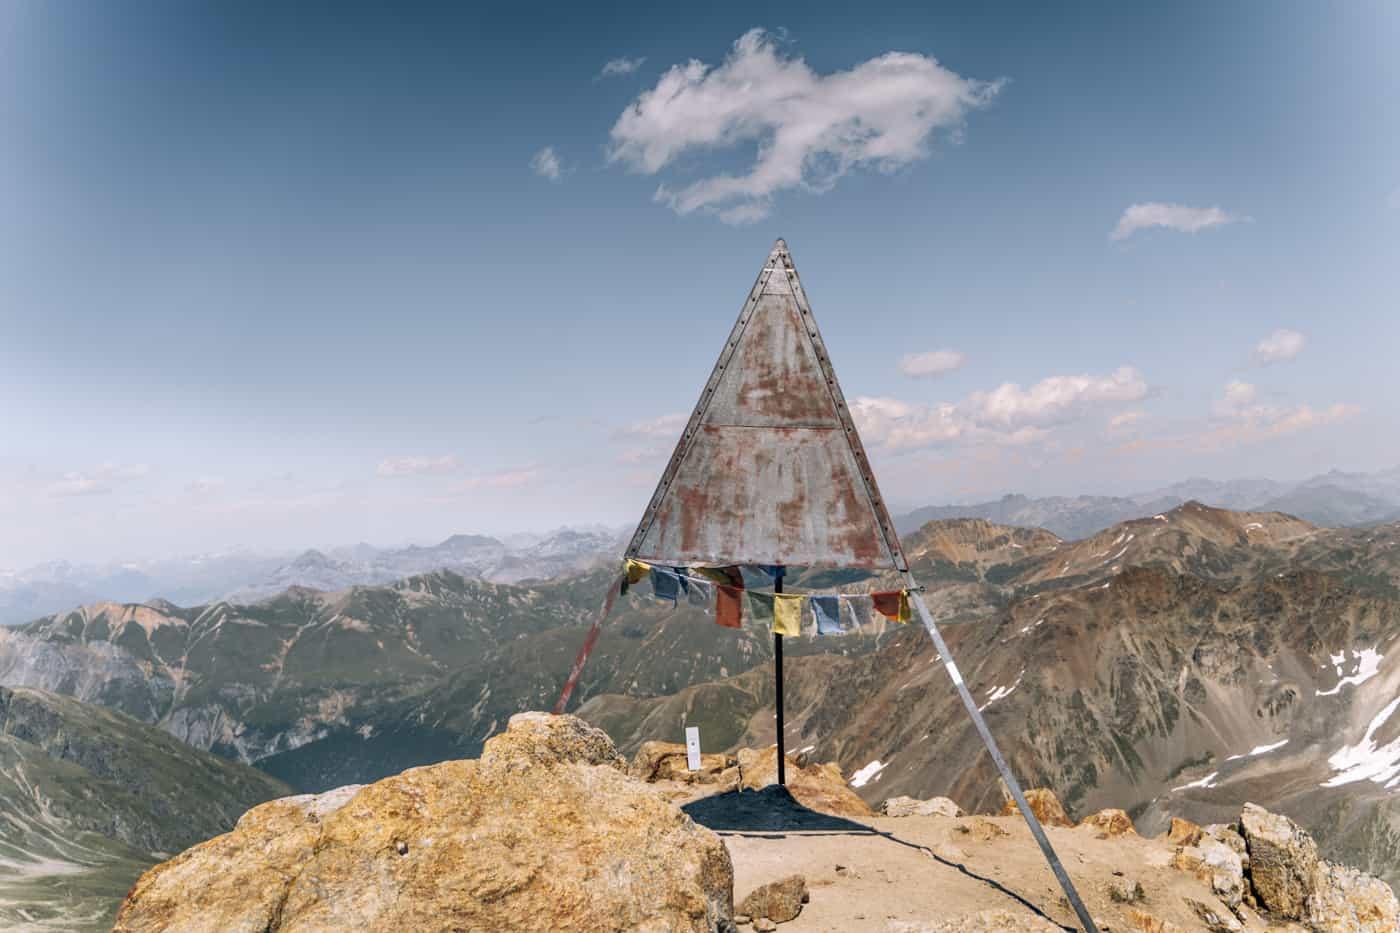 Wandern in Pontresina - 5 unvergessliche Bergtouren: Muottas Muragl - Piz Languard - Alp Languard